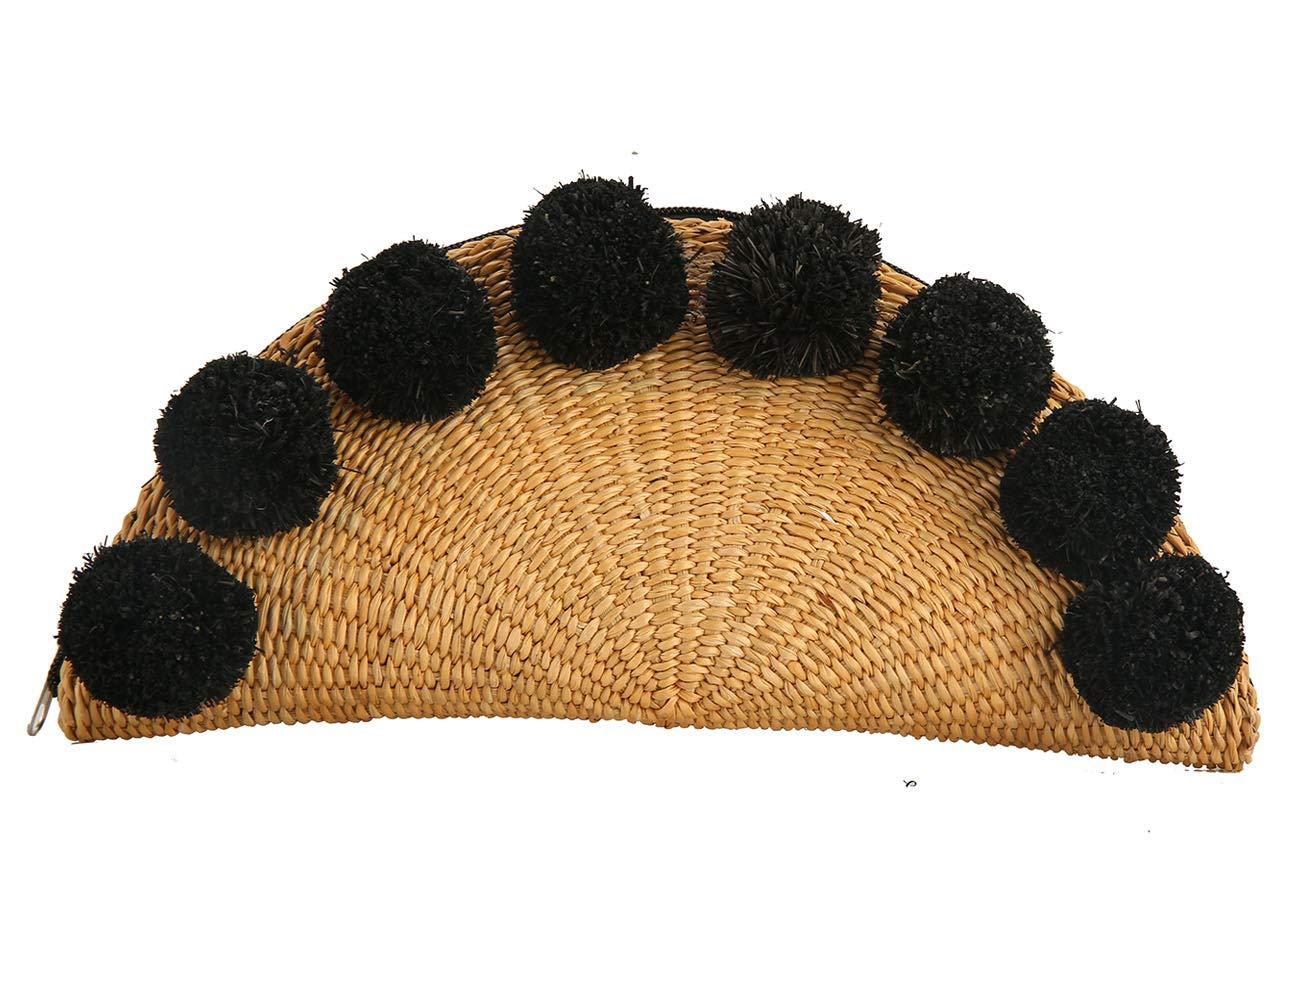 Straw Bag Woven Clutch Purse Chic Summer Beach Handbags (fan)